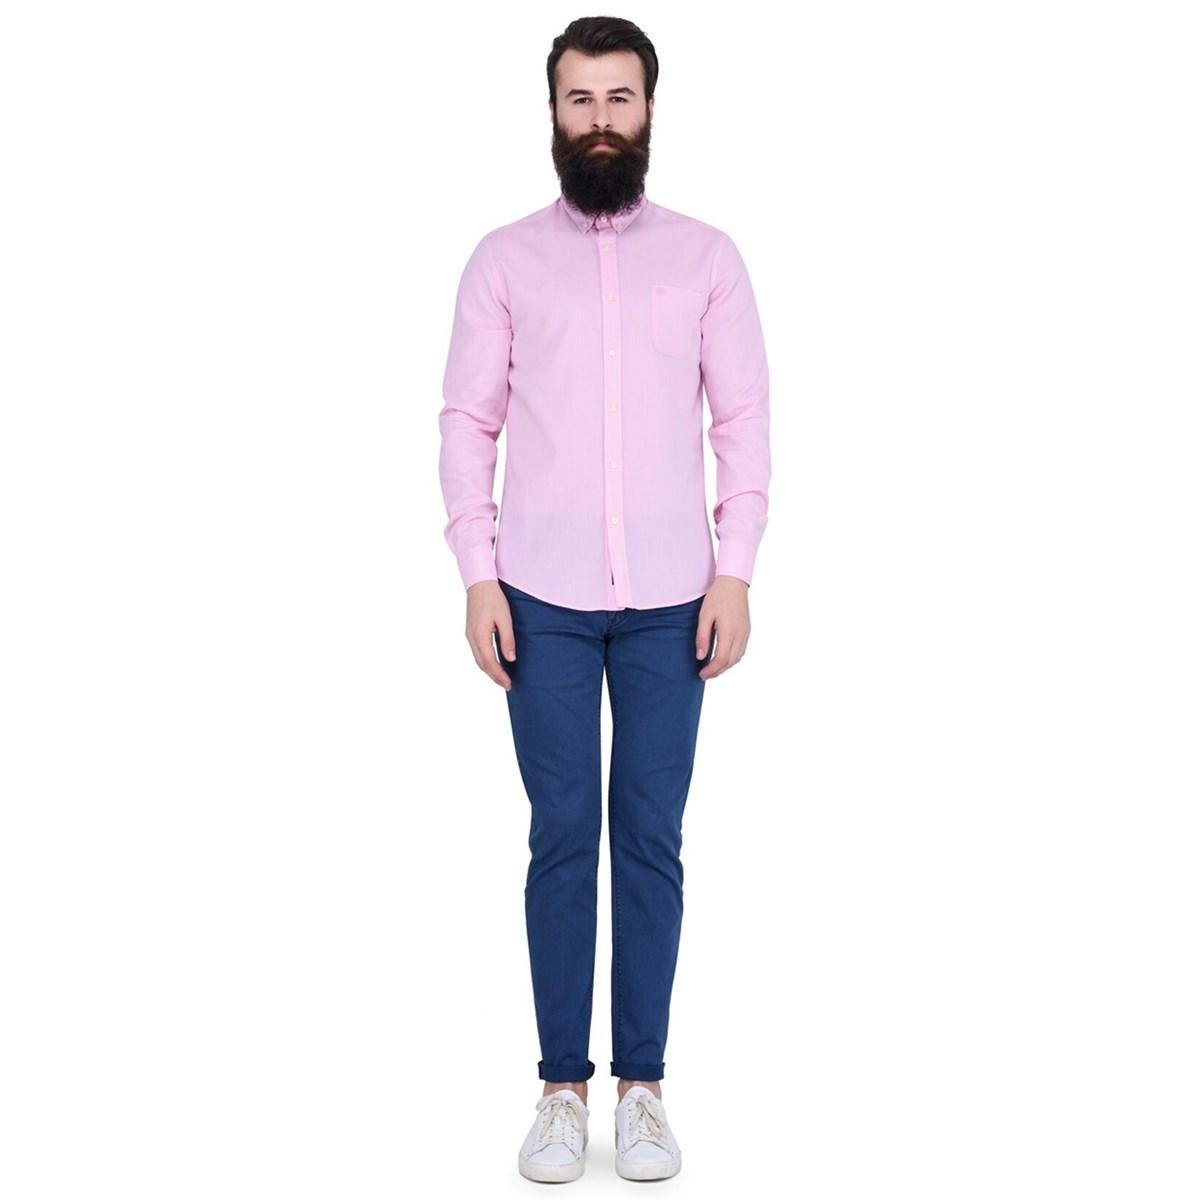 Blais Erkek Pembe Günlük Gömlek